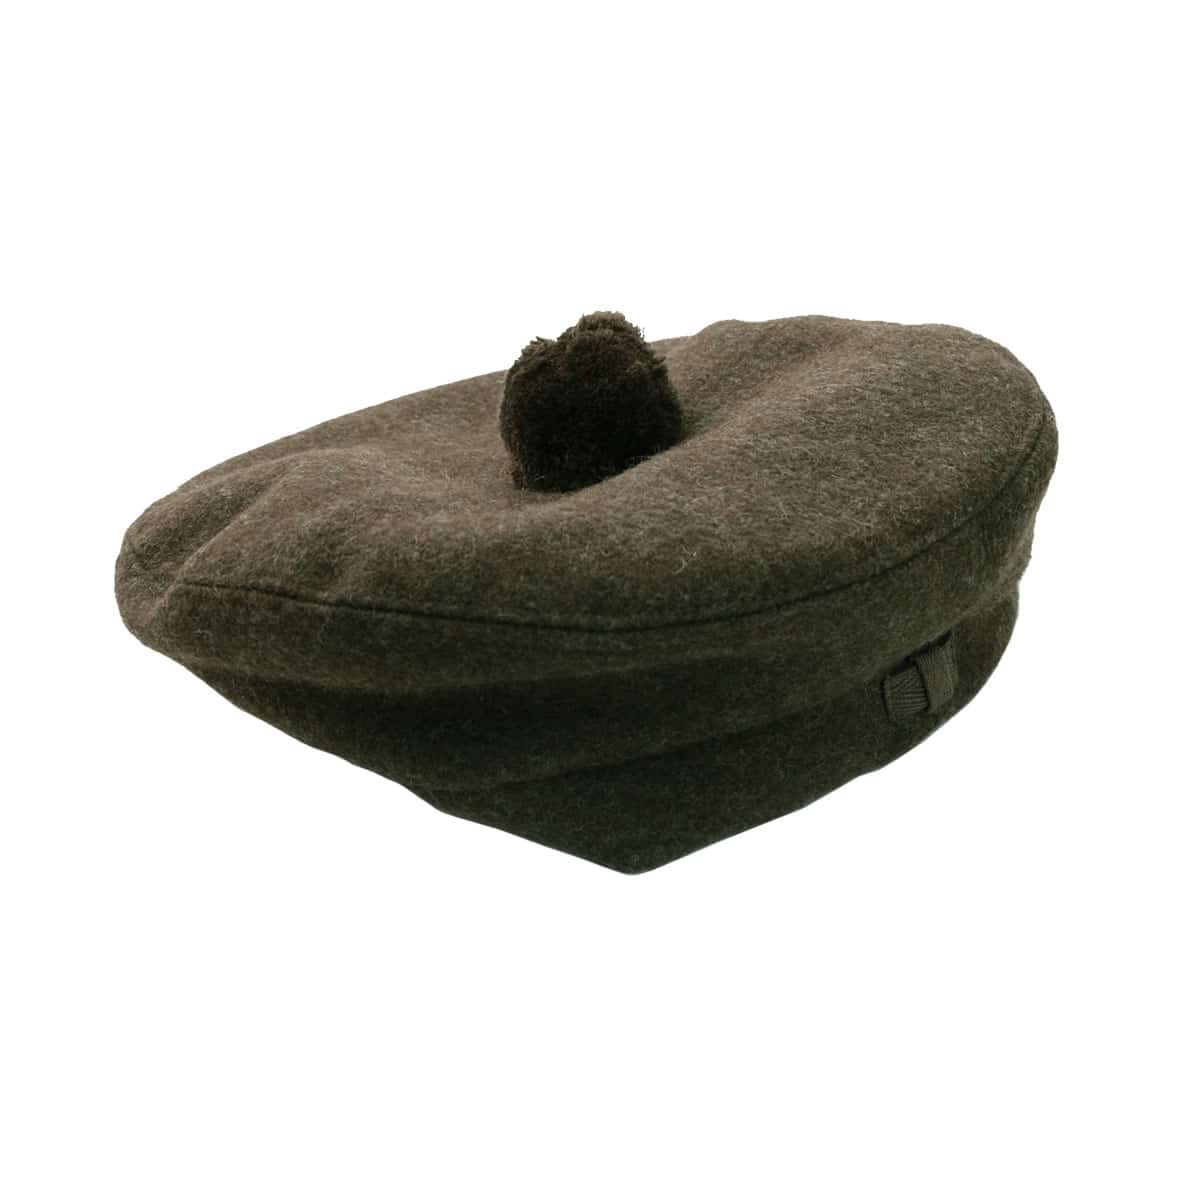 Details about  /Scottish Highlanders Tartans Balmorals Military Army Hats Caps Headgear Headwear